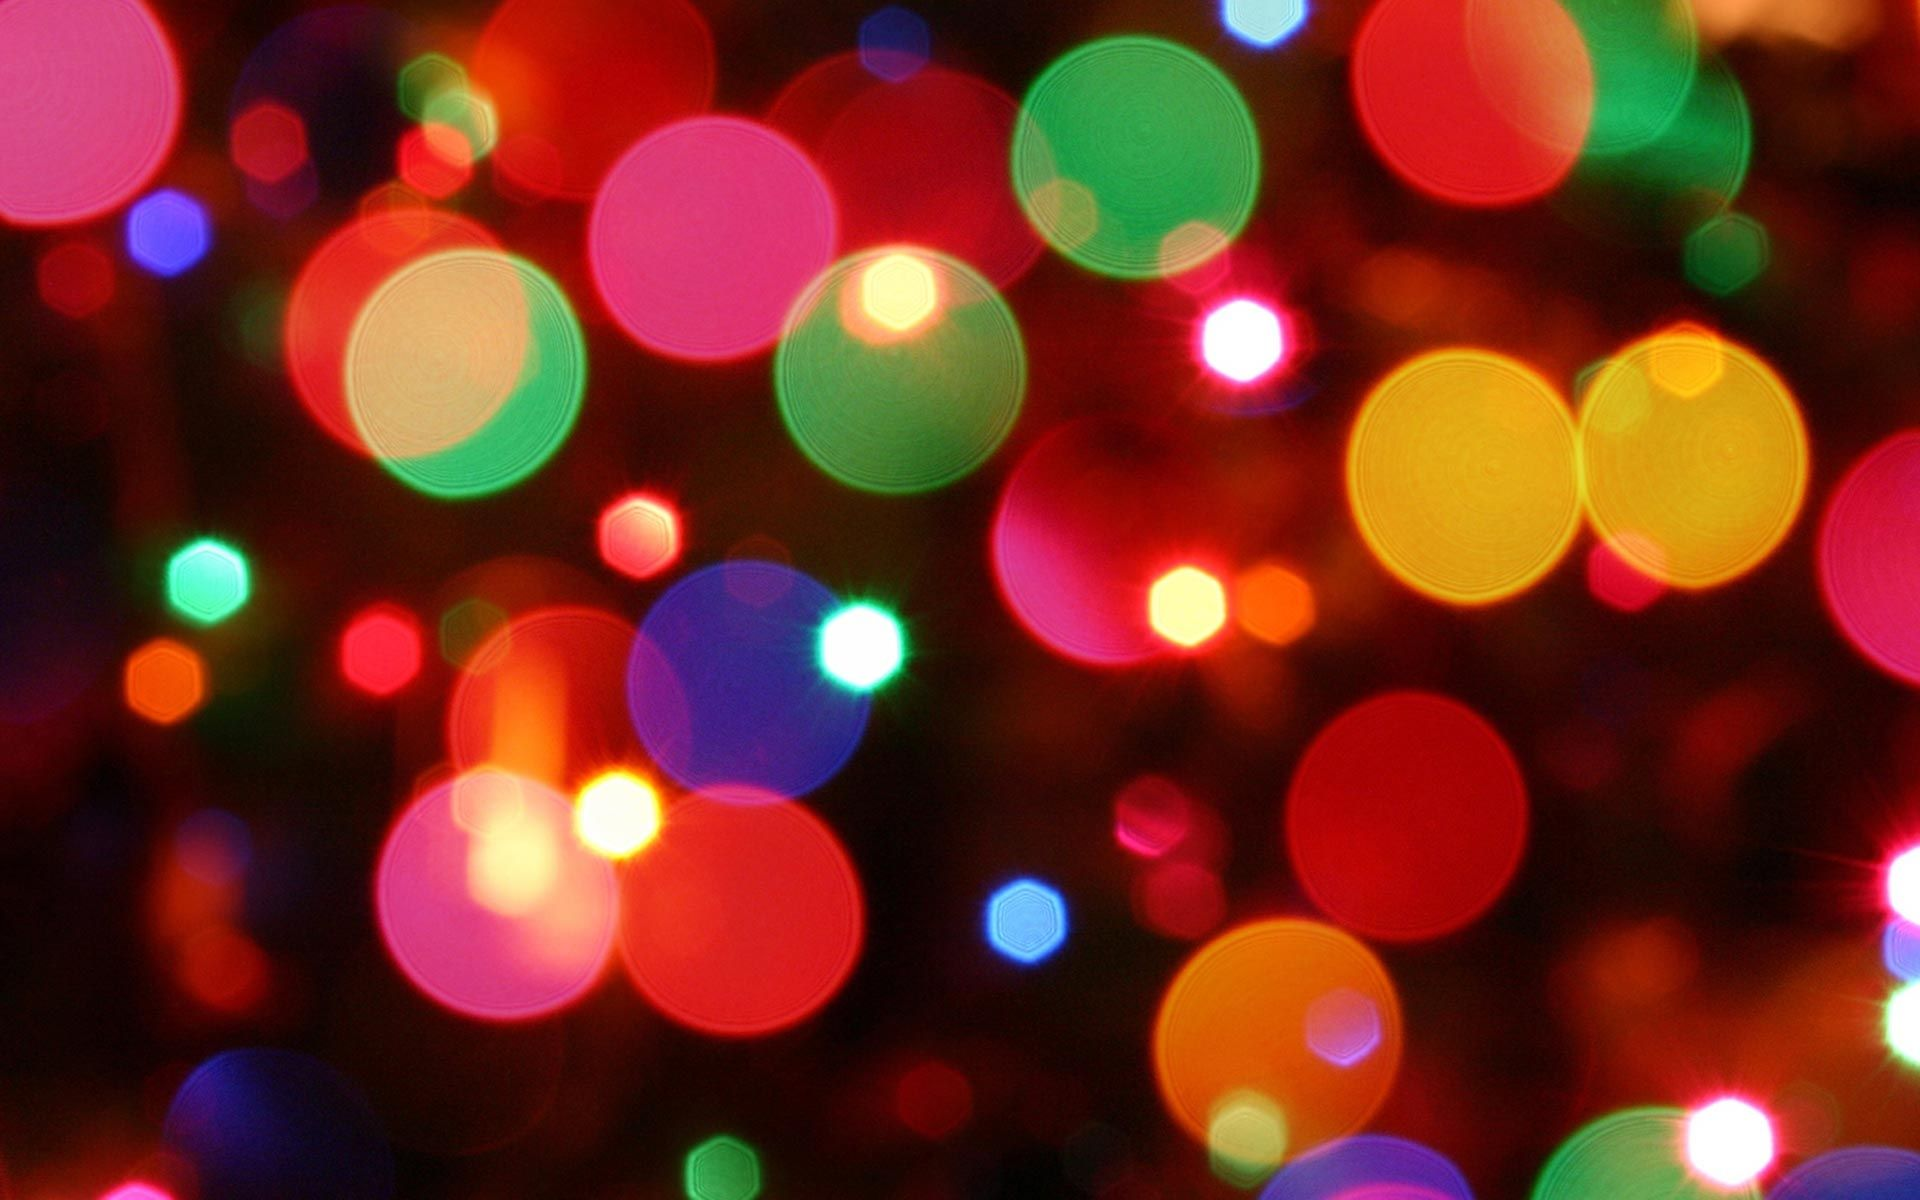 Cool Backgrounds Wallpaper Christmas Wallpaper Free Christmas Lights Wallpaper Holiday Lights